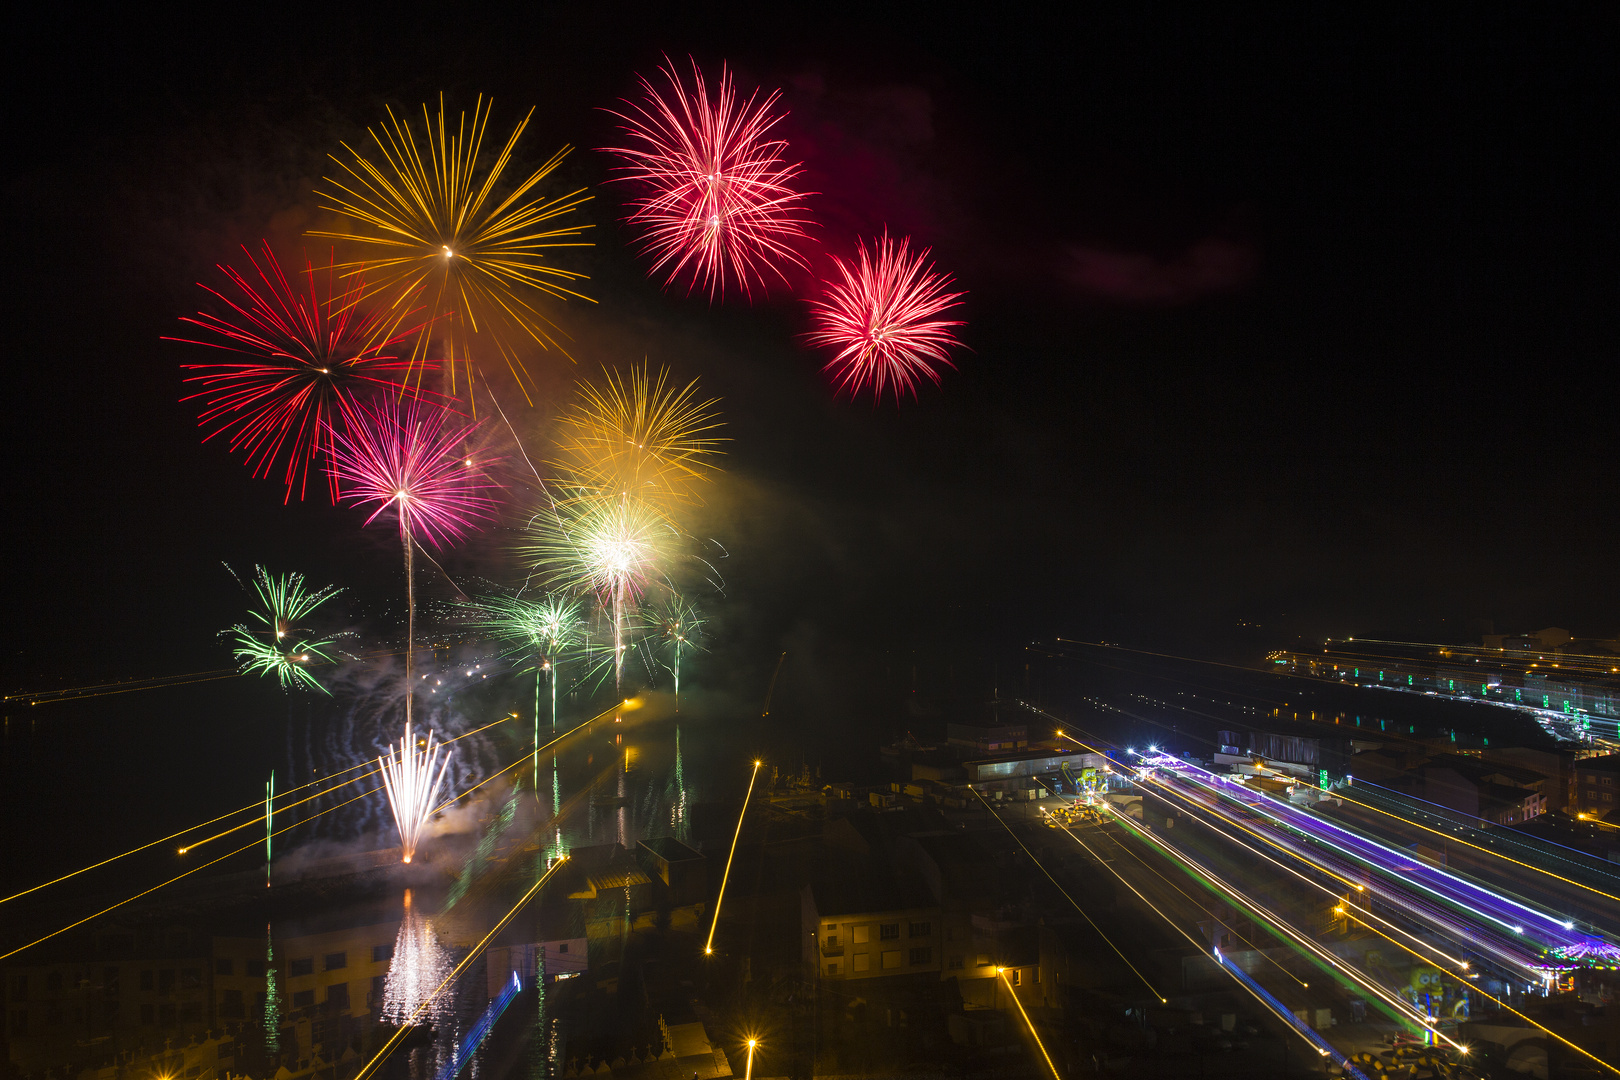 Festas da Barca, Muxia